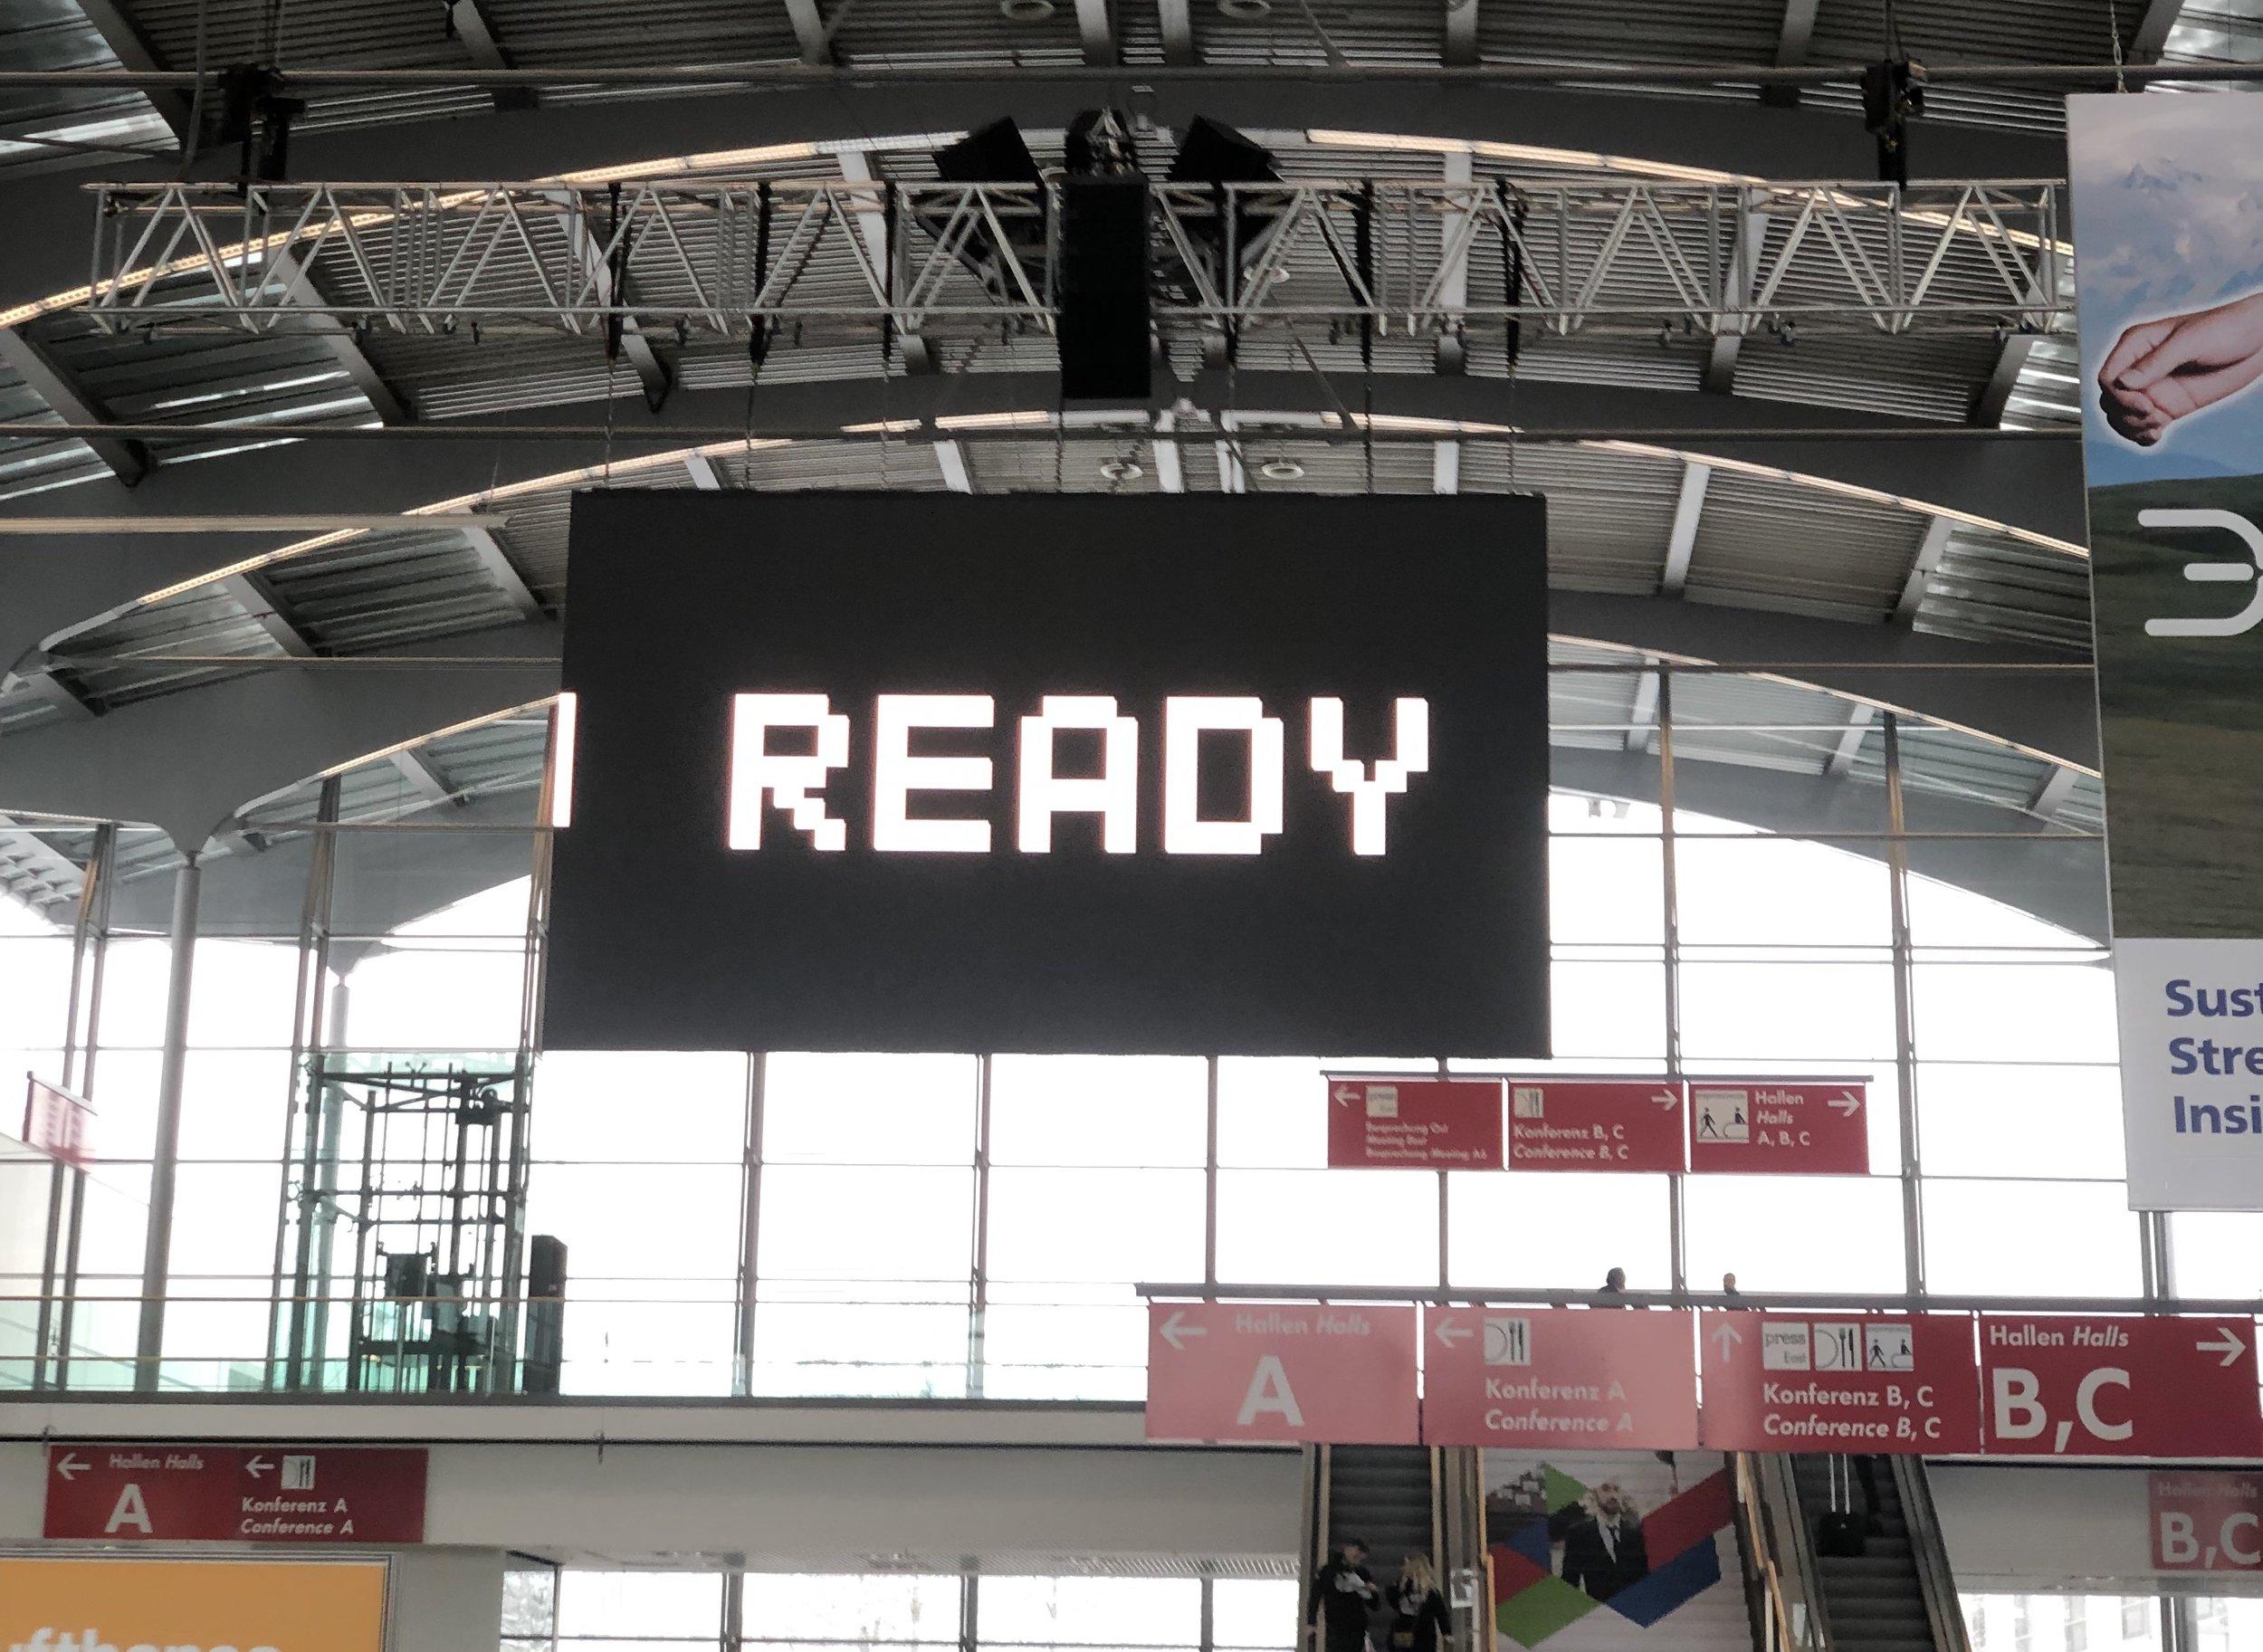 ispo ready sign.jpg